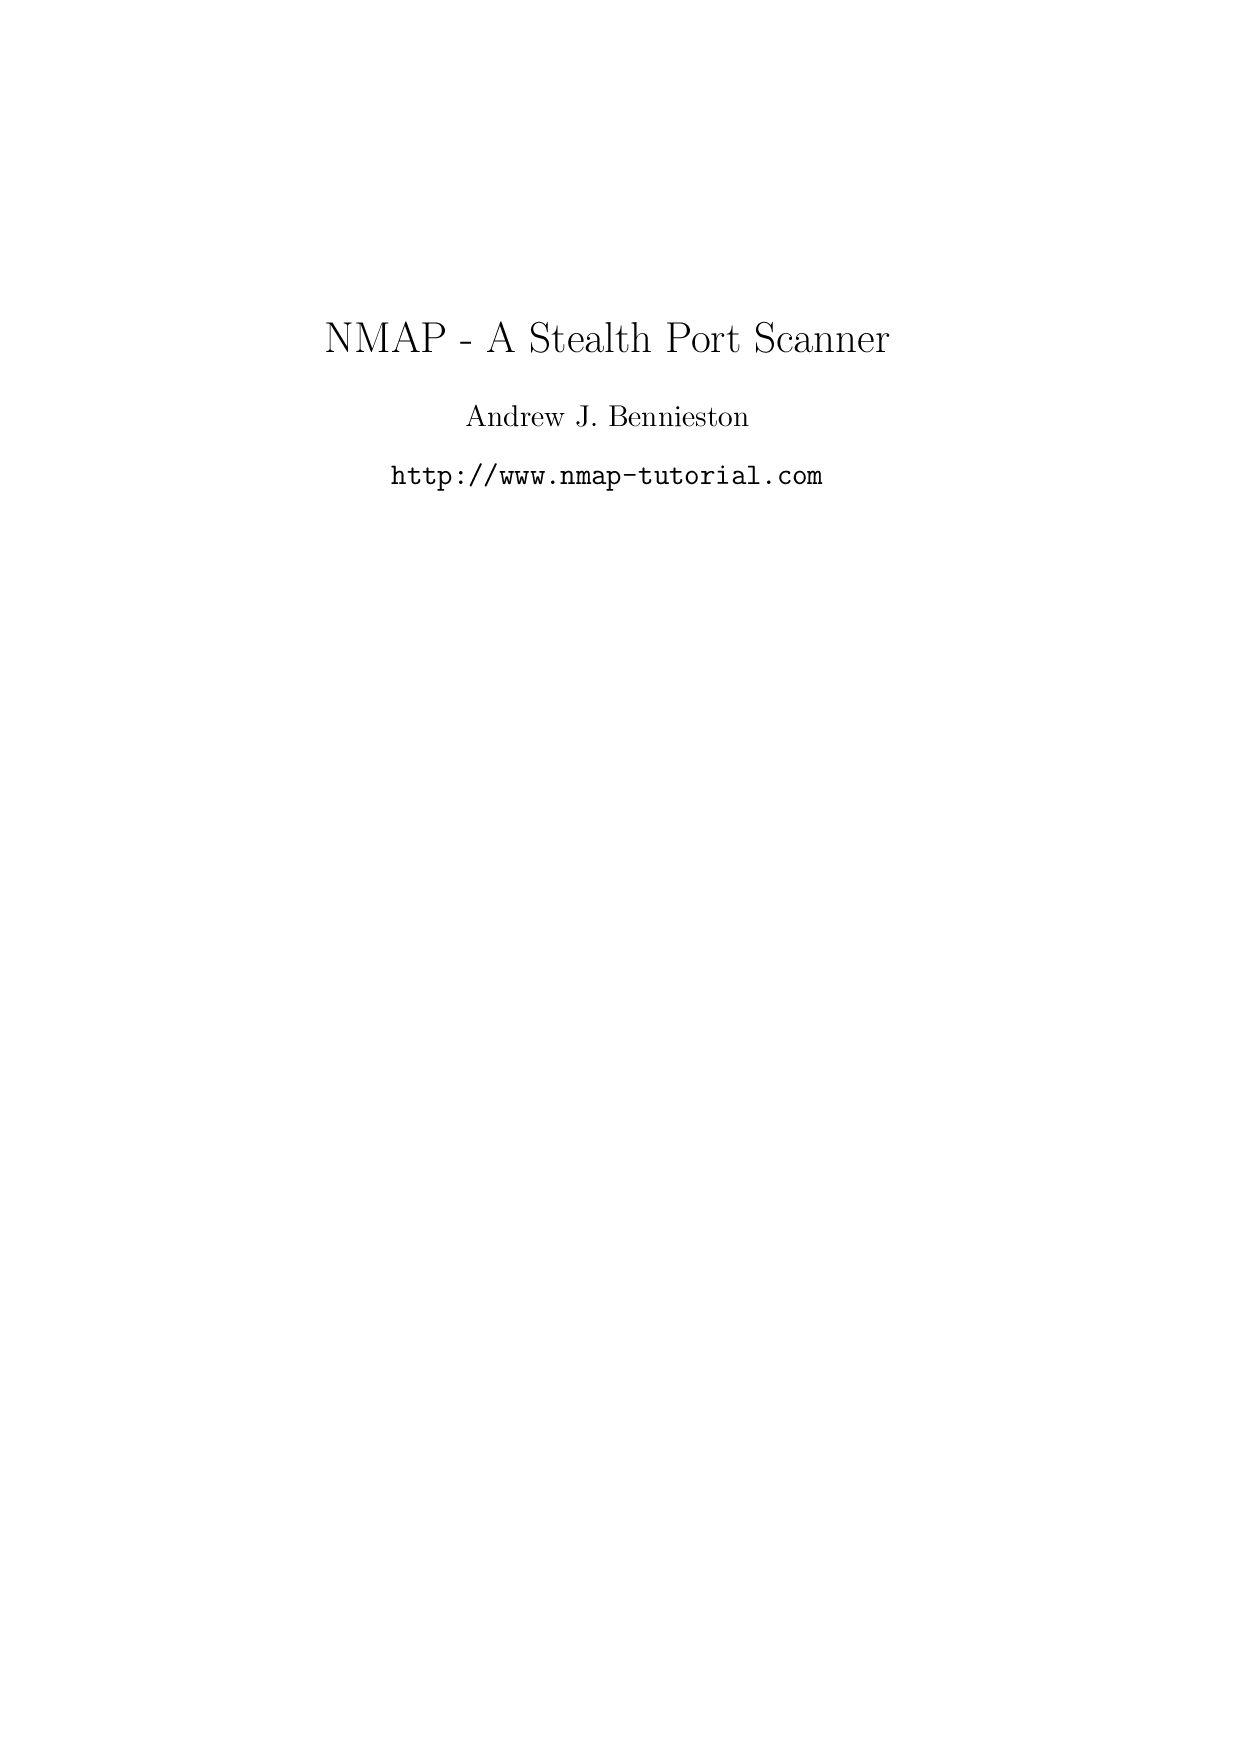 NMAP - A Stealth Port Scanner by Gabriela Torres - issuu